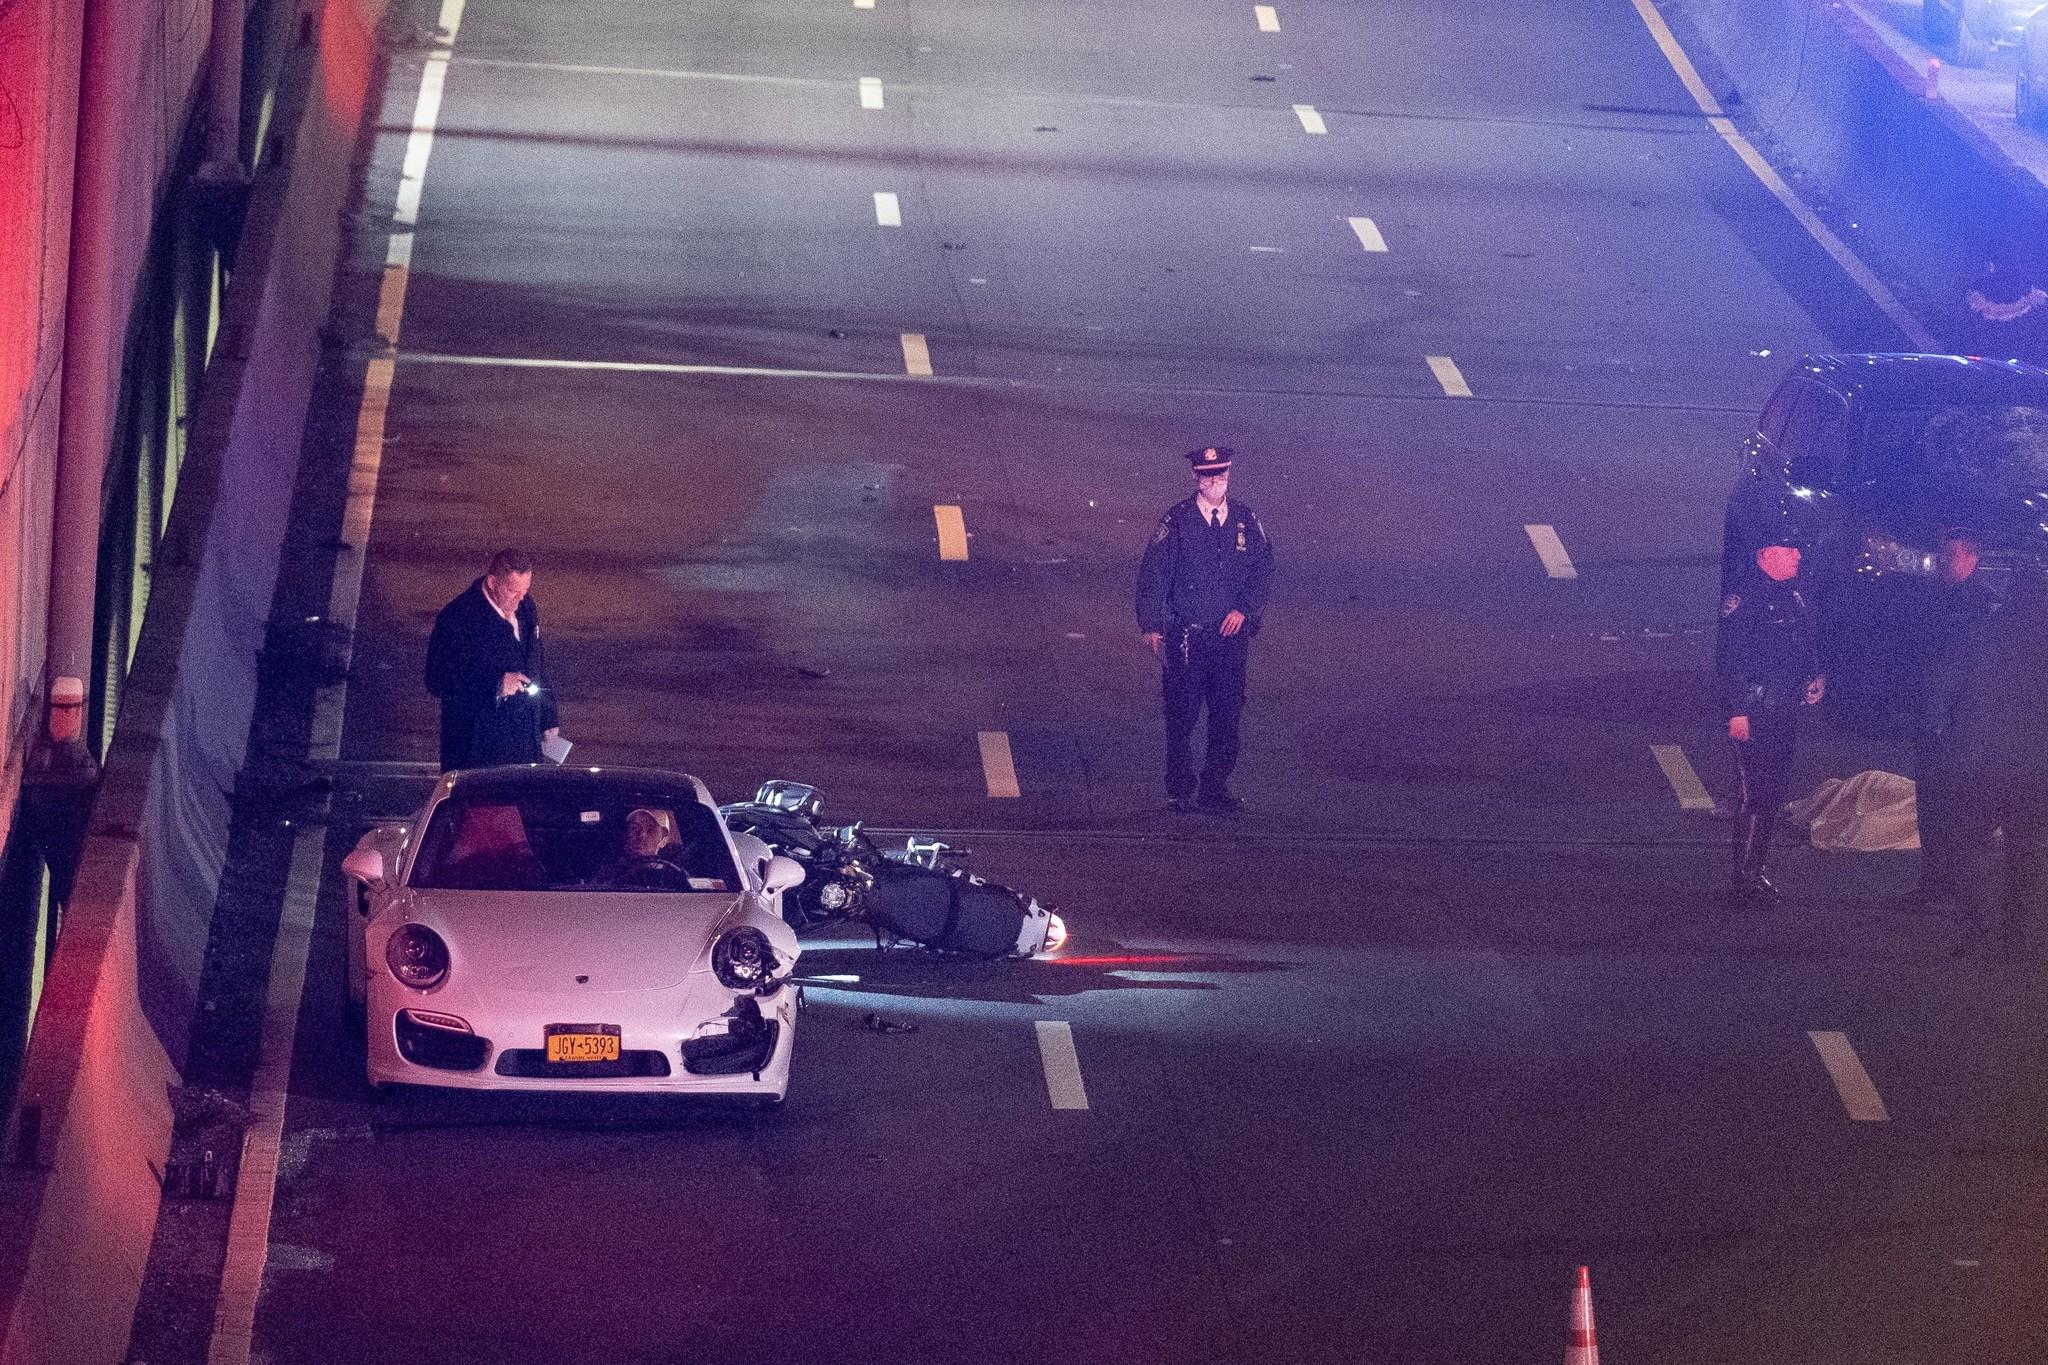 Motorcyclist dies in 3-vehicle crash on Henry Hudson Parkway